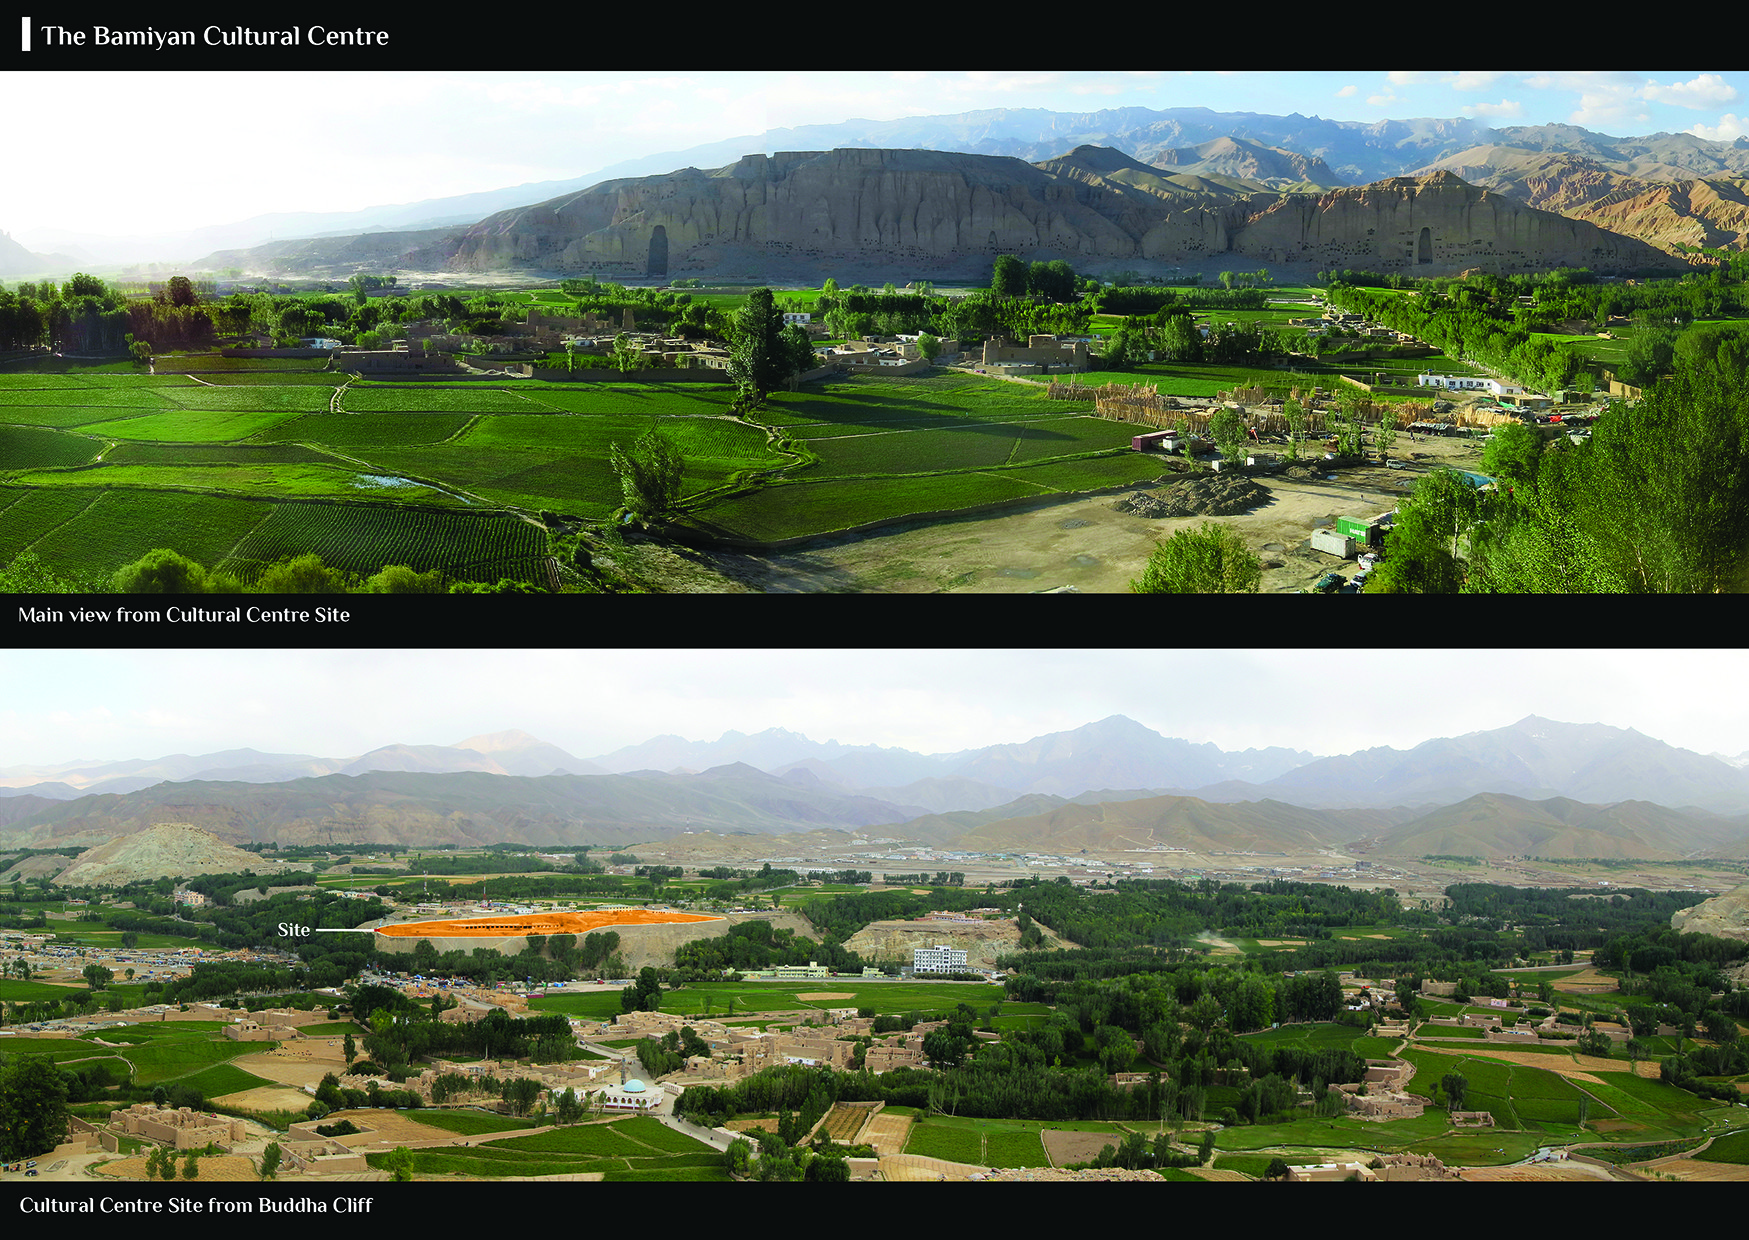 UNESCO lanza concurso de diseño para el Centro Cultural de Bamiyan en Afganistán